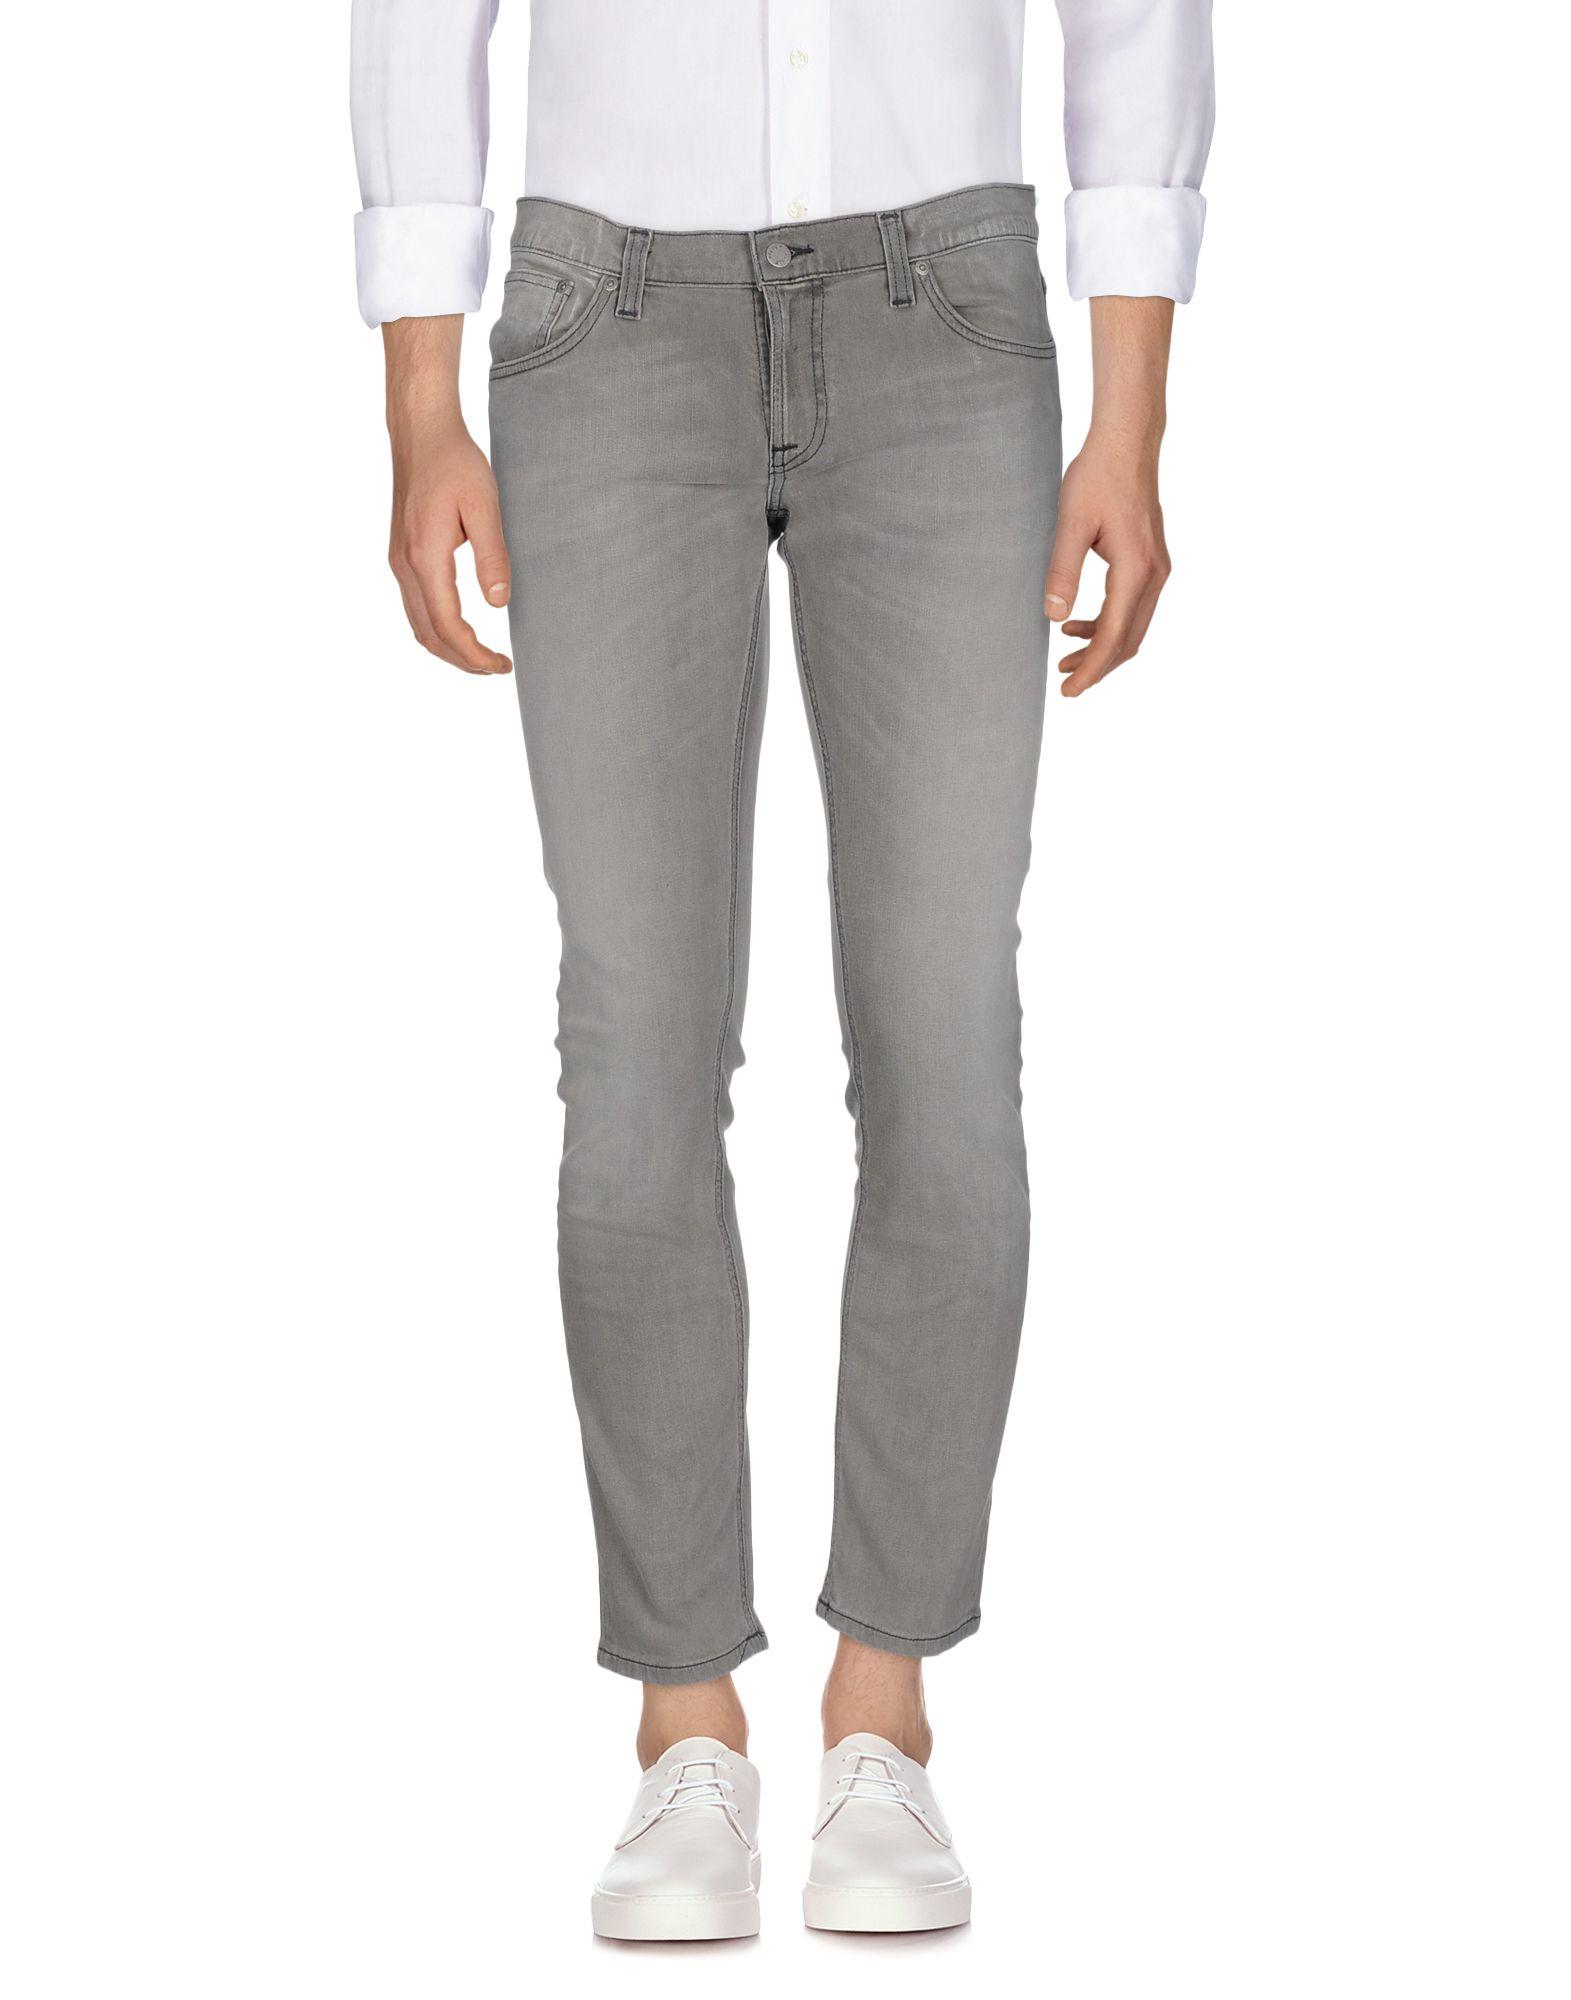 цена NUDIE JEANS CO Джинсовые брюки онлайн в 2017 году